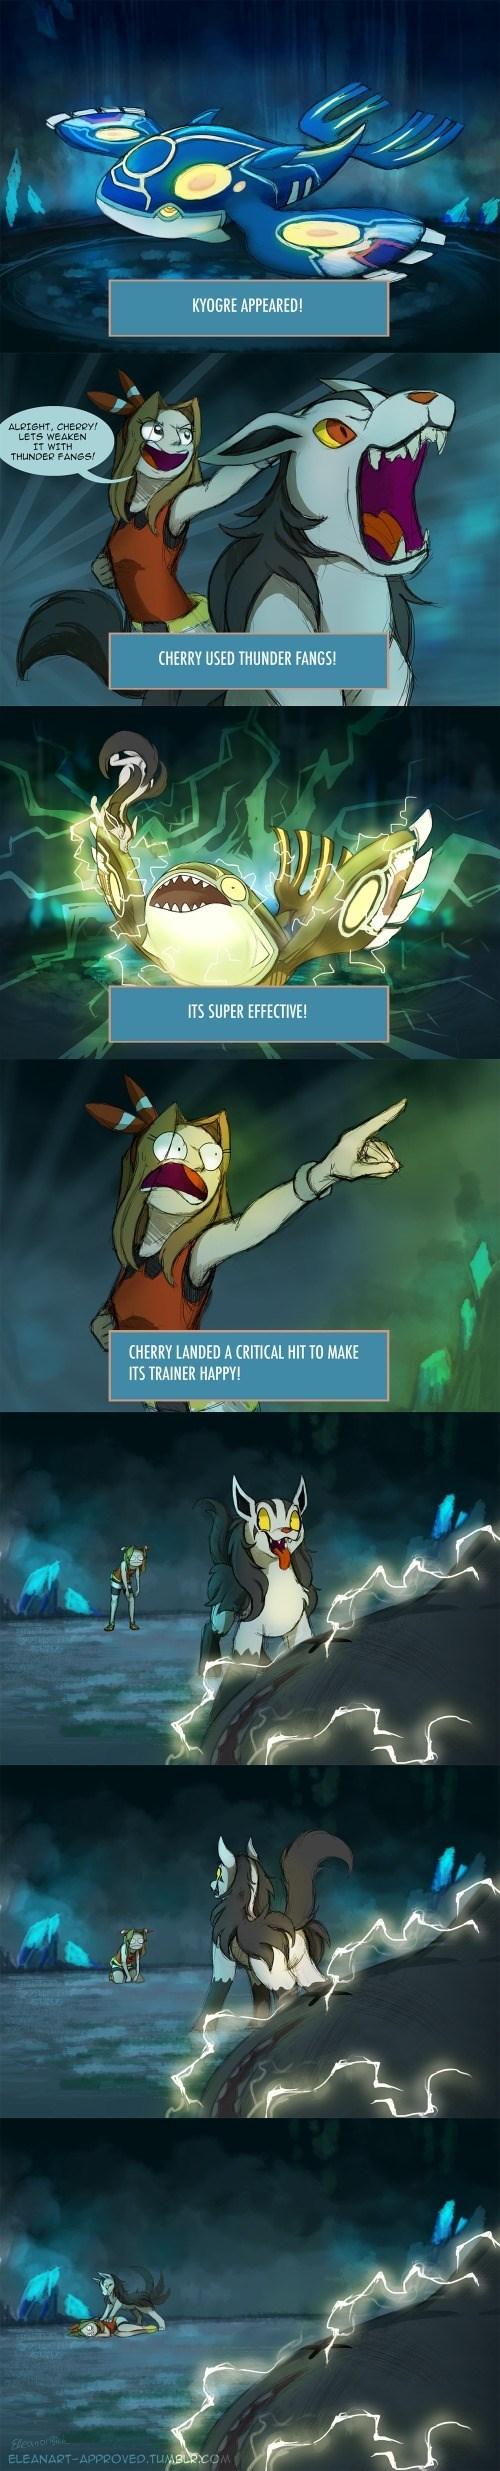 pokemon memes kyogre faints